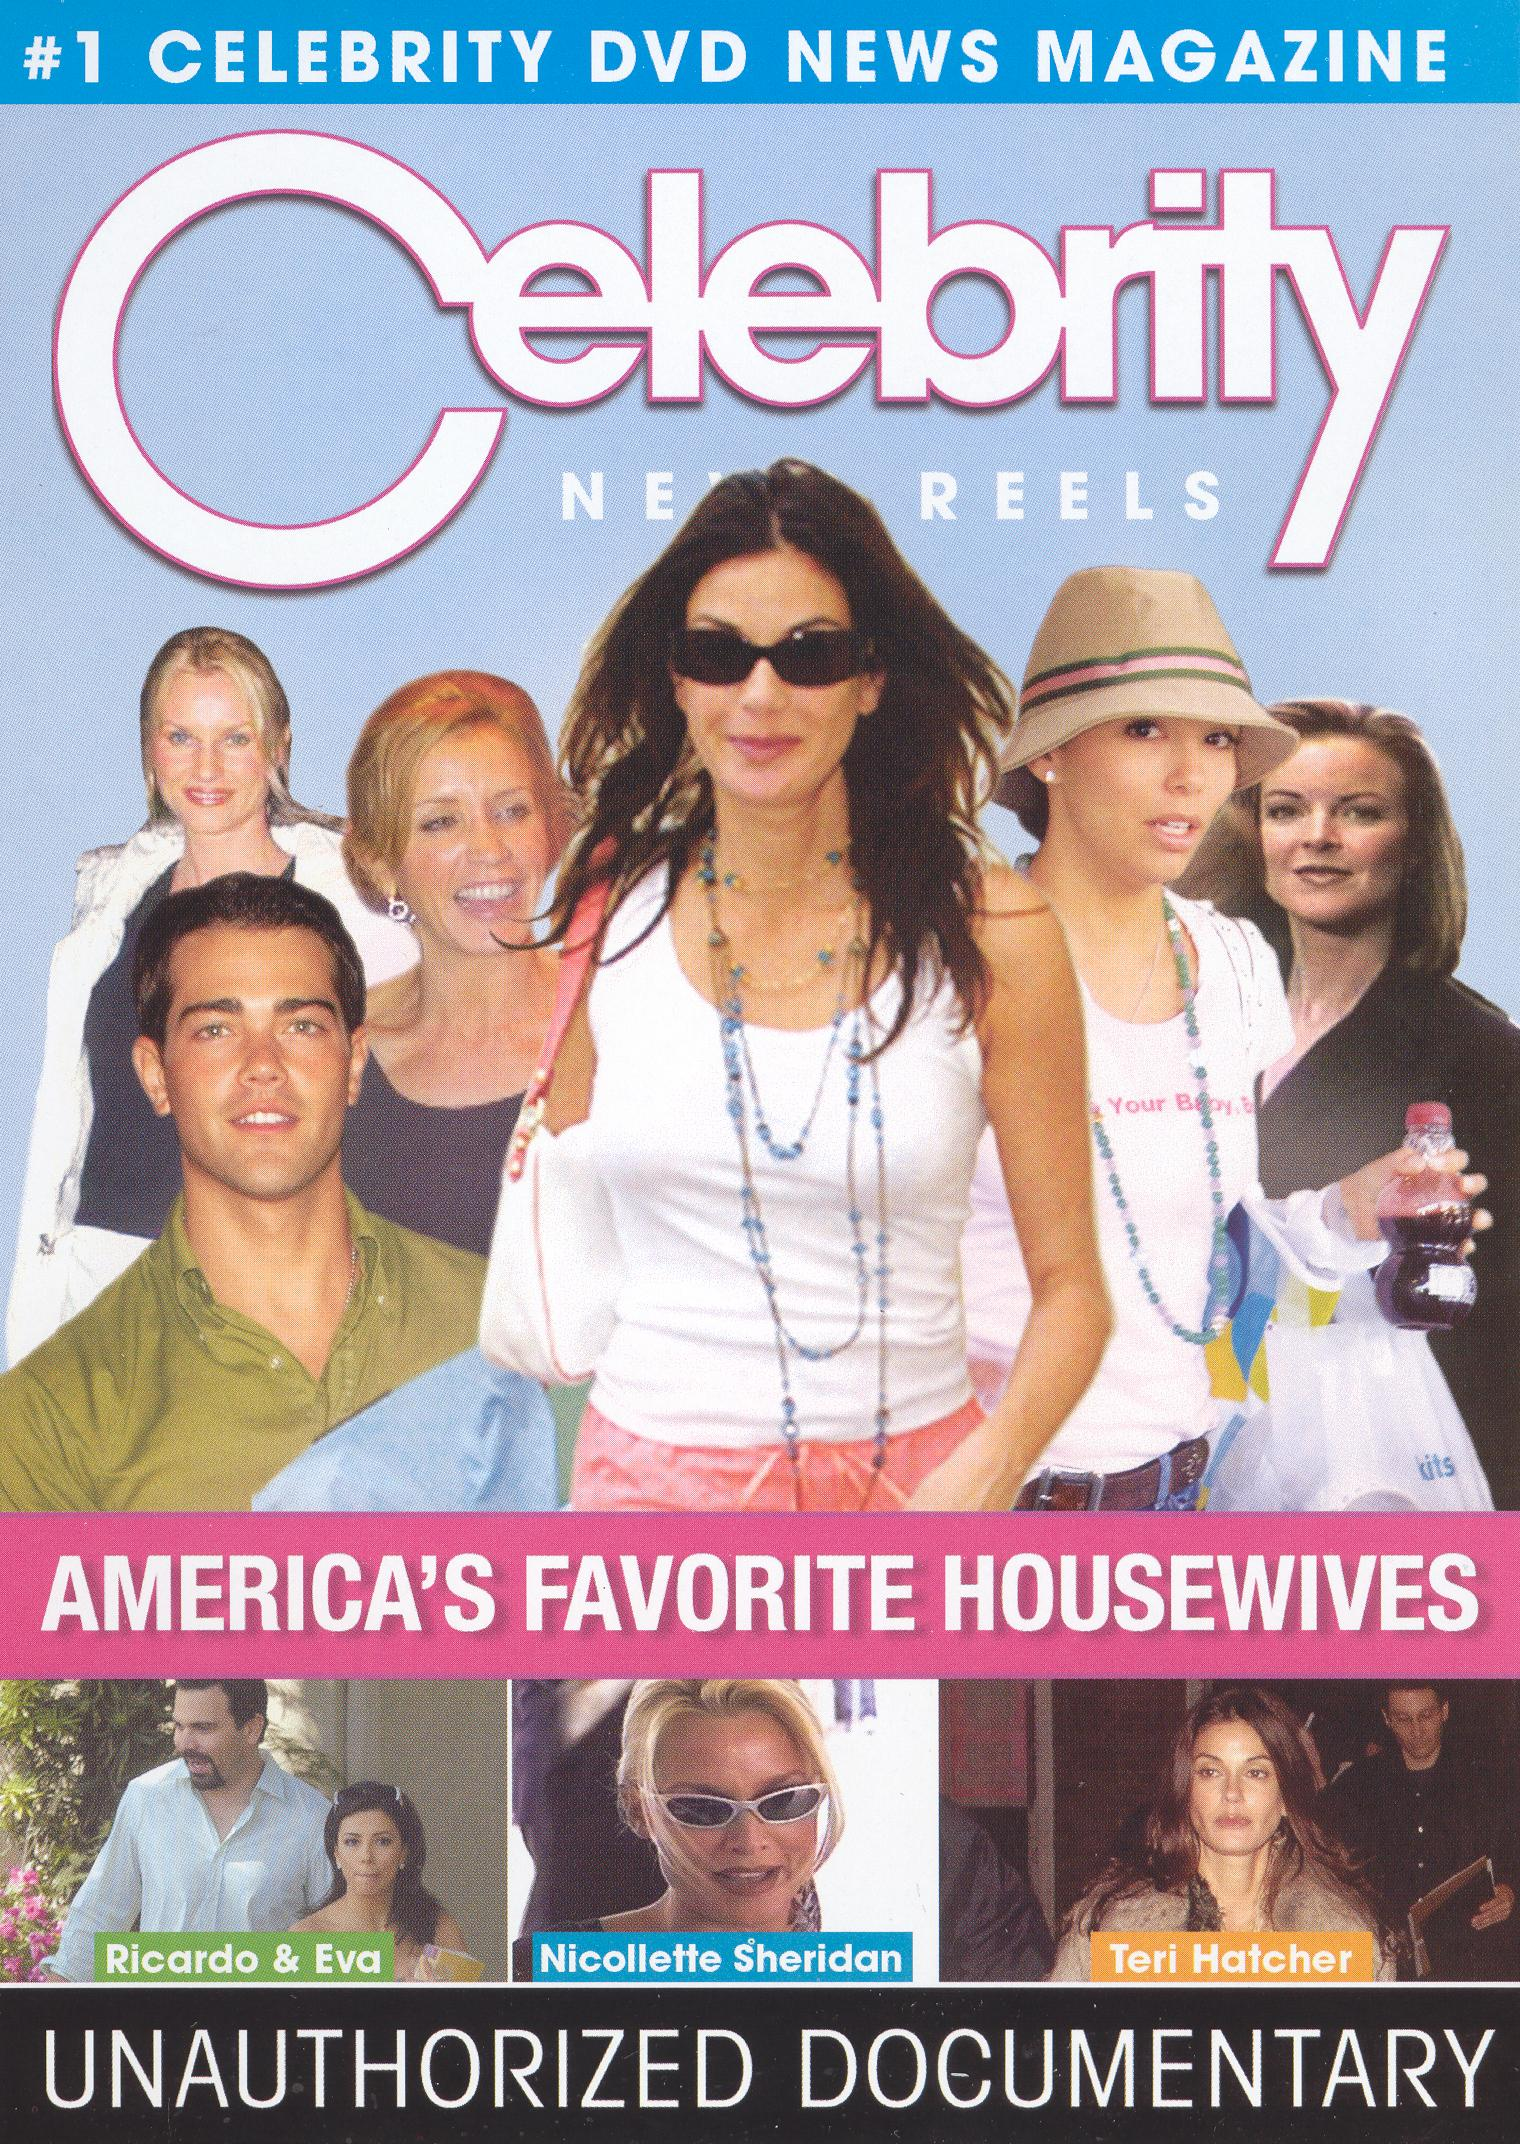 Celebrity News Reels: America's Favorite Housewives